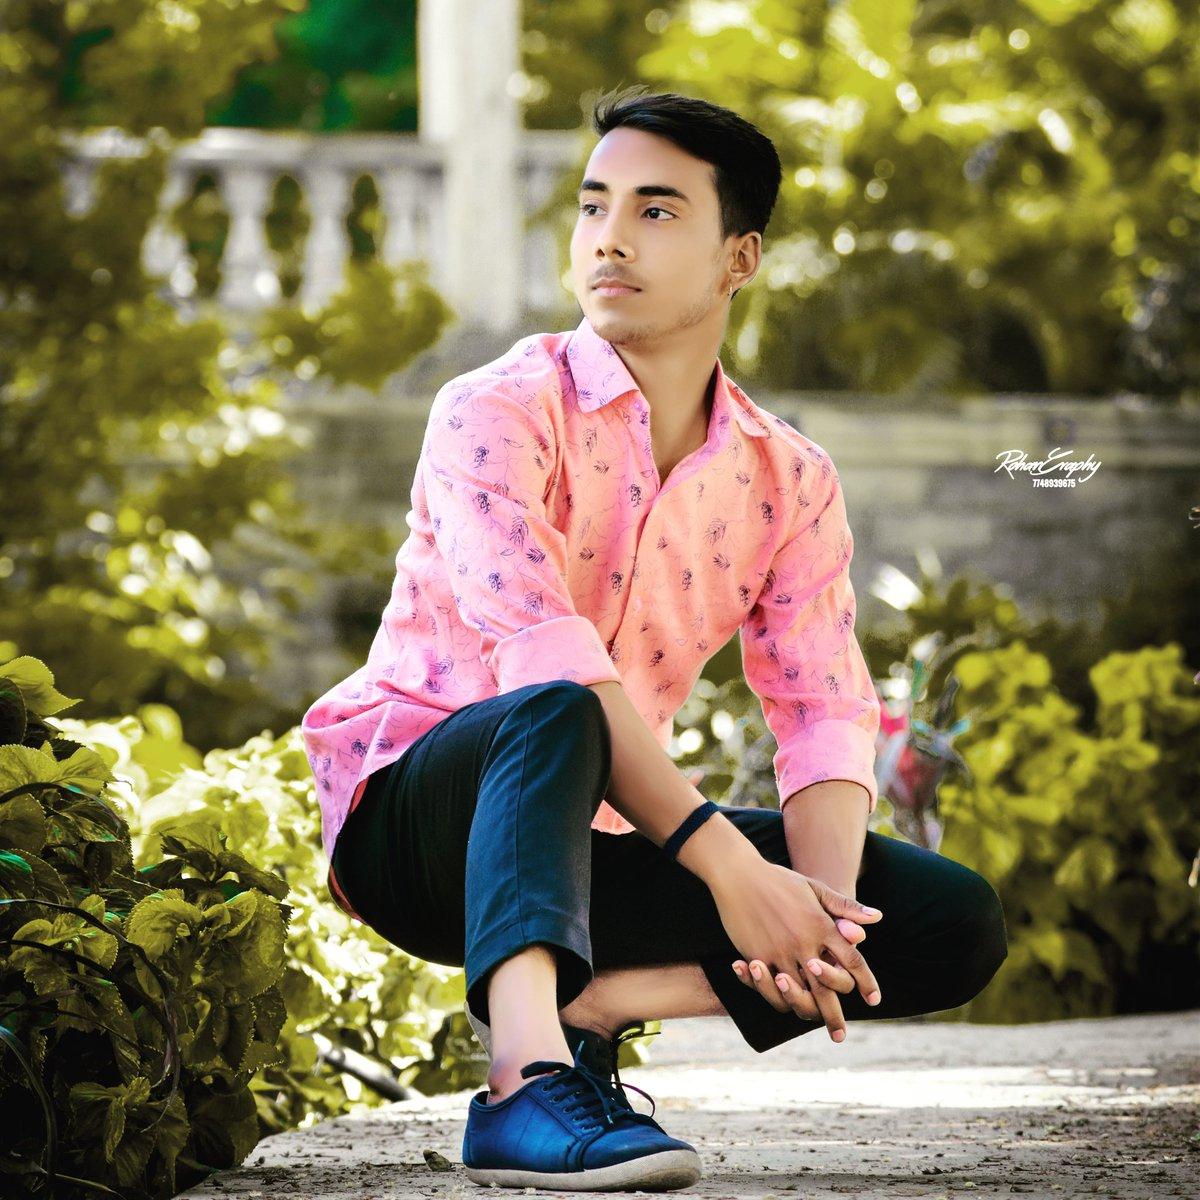 😍back_venture_@bio_sevart🤘🤘💕#instagramhub #nice #bored #all_shots  #throwback #home #loveit #jj #picstitch #colorful #20likes #shoes #instaphoto #snow #instacollage #harrystyles #boyfriend #niallhoran #statigram #tired #in #followback #instagramers #doubletap #model #nike